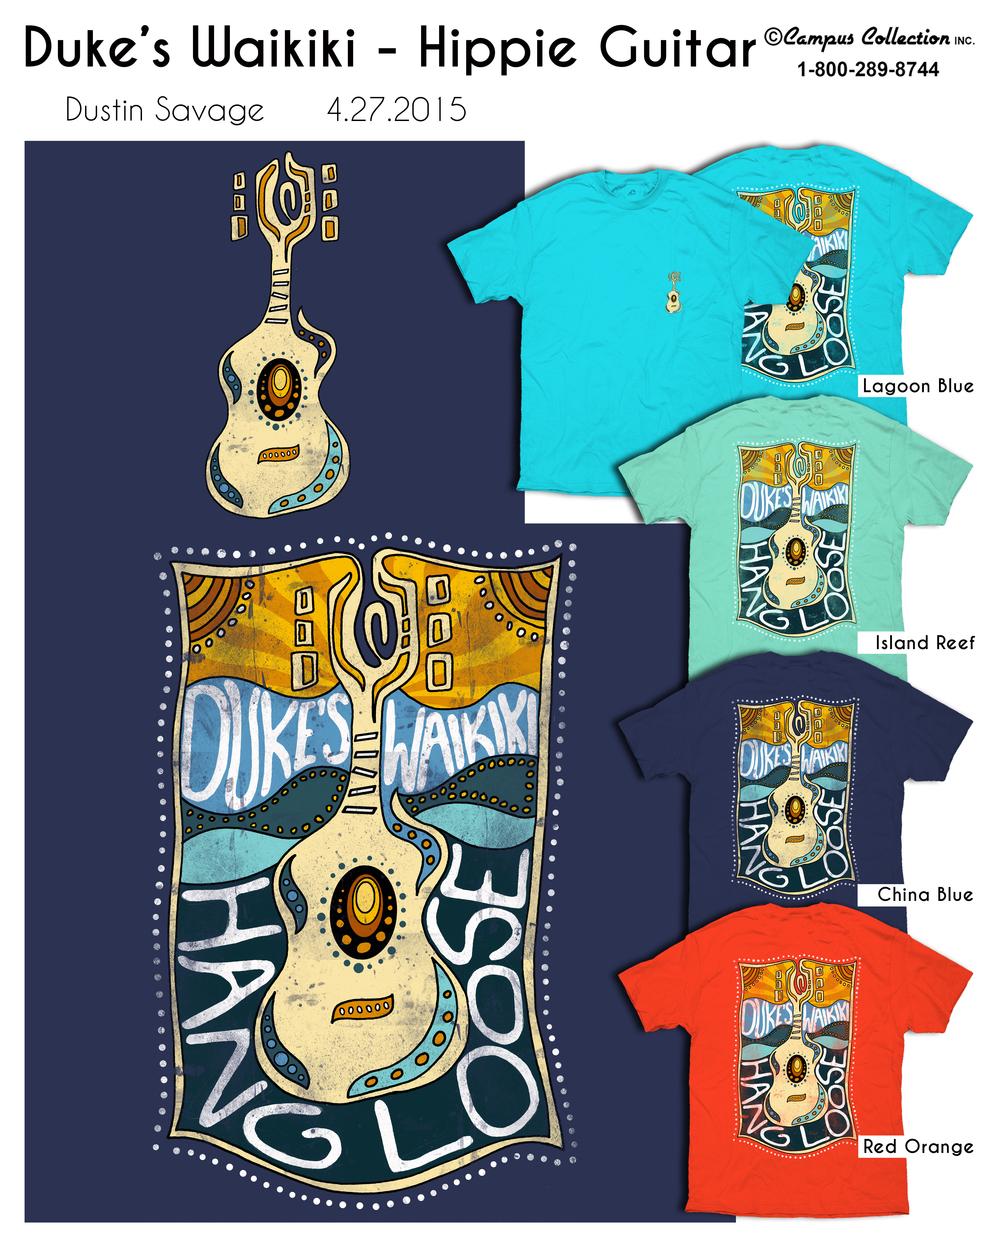 Dukes Waikiki_Hippie Guitar.jpg